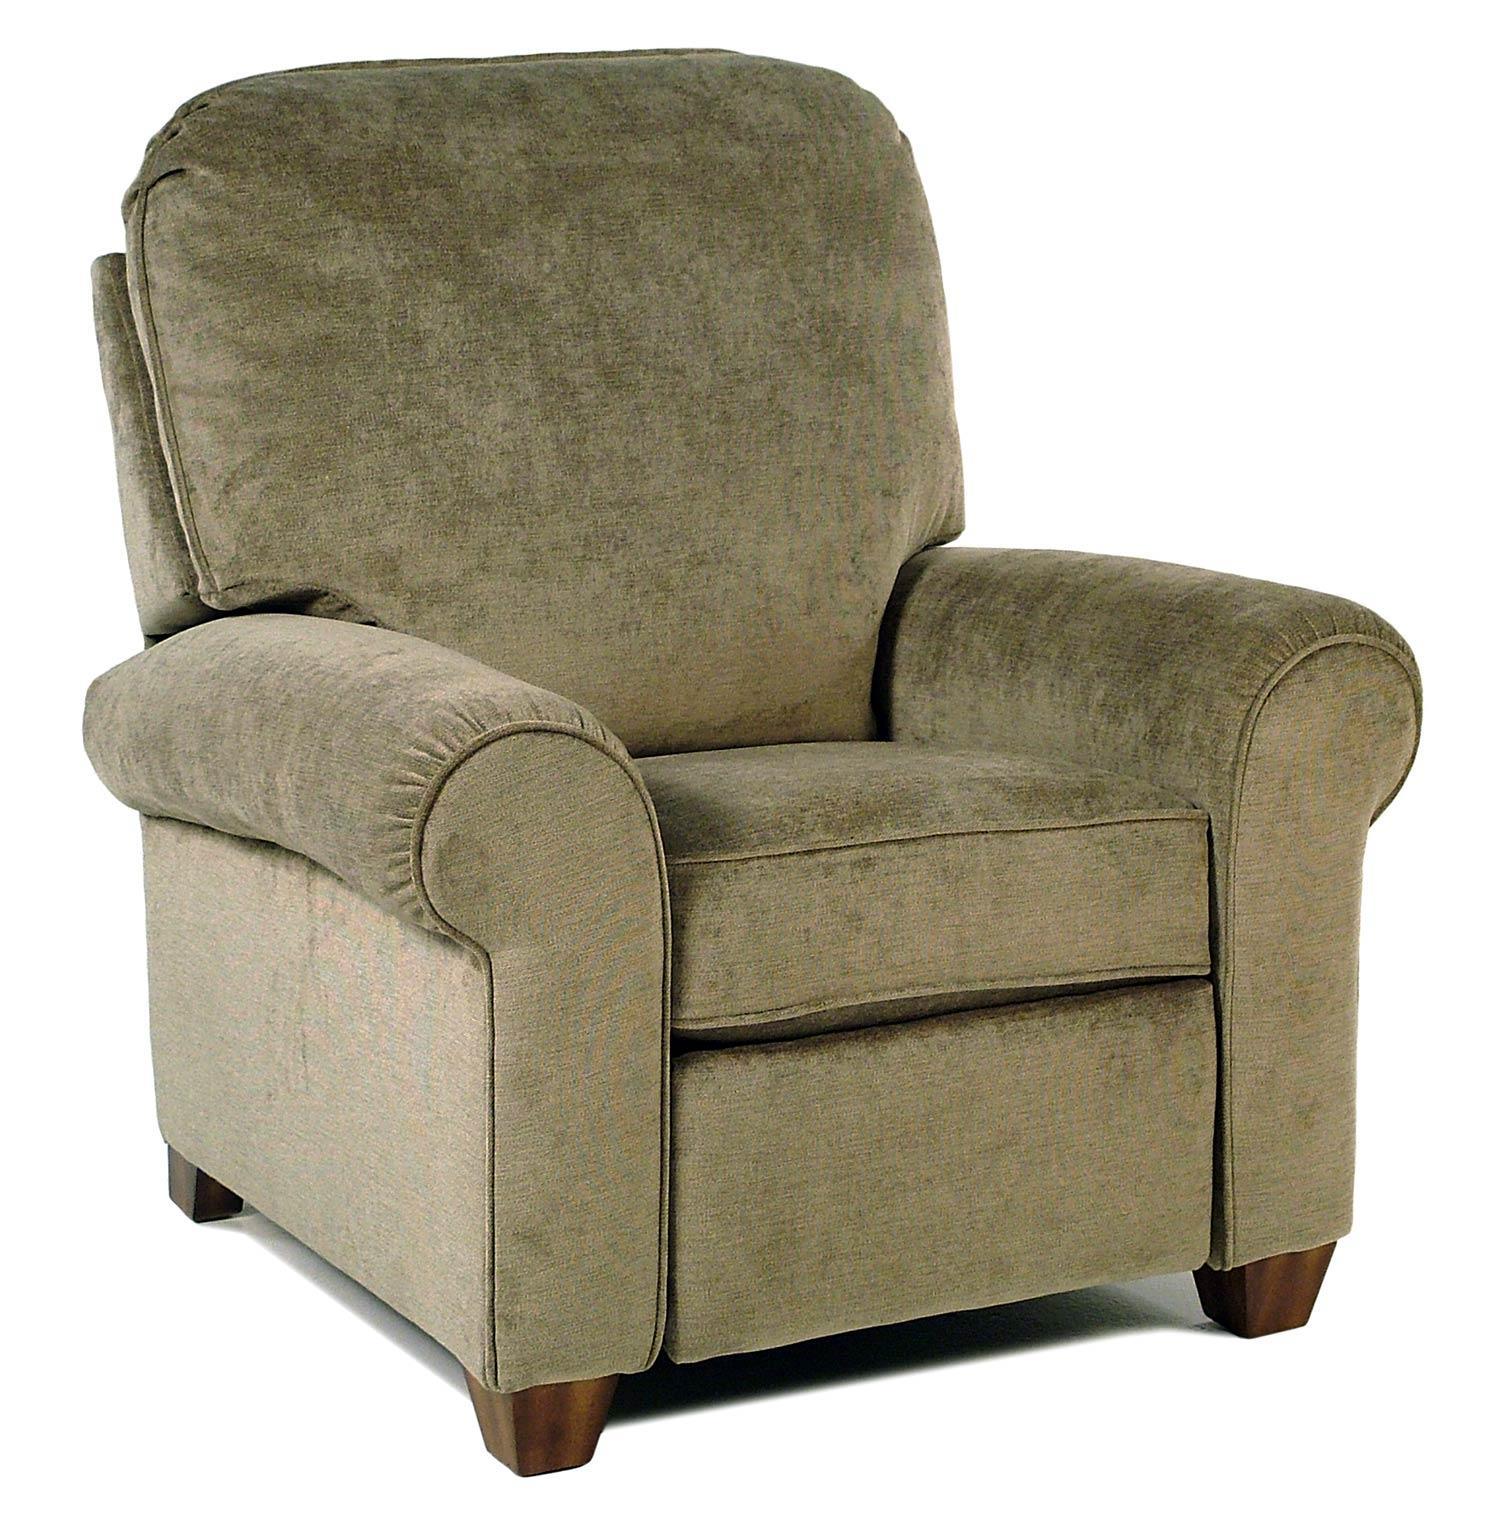 flexsteel thornton sectional sofa electric blue velvet price 3 piece ...